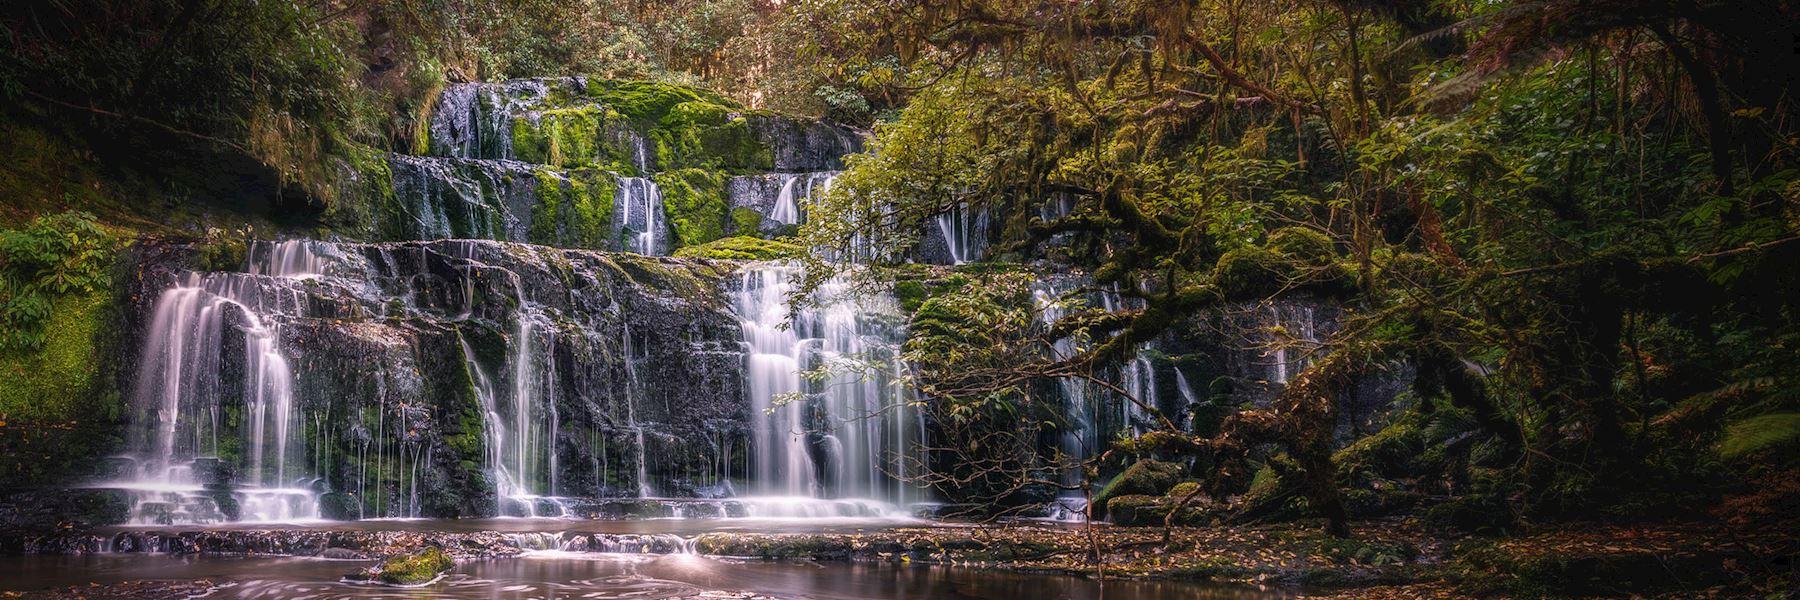 Visit the Catlins, New Zealand